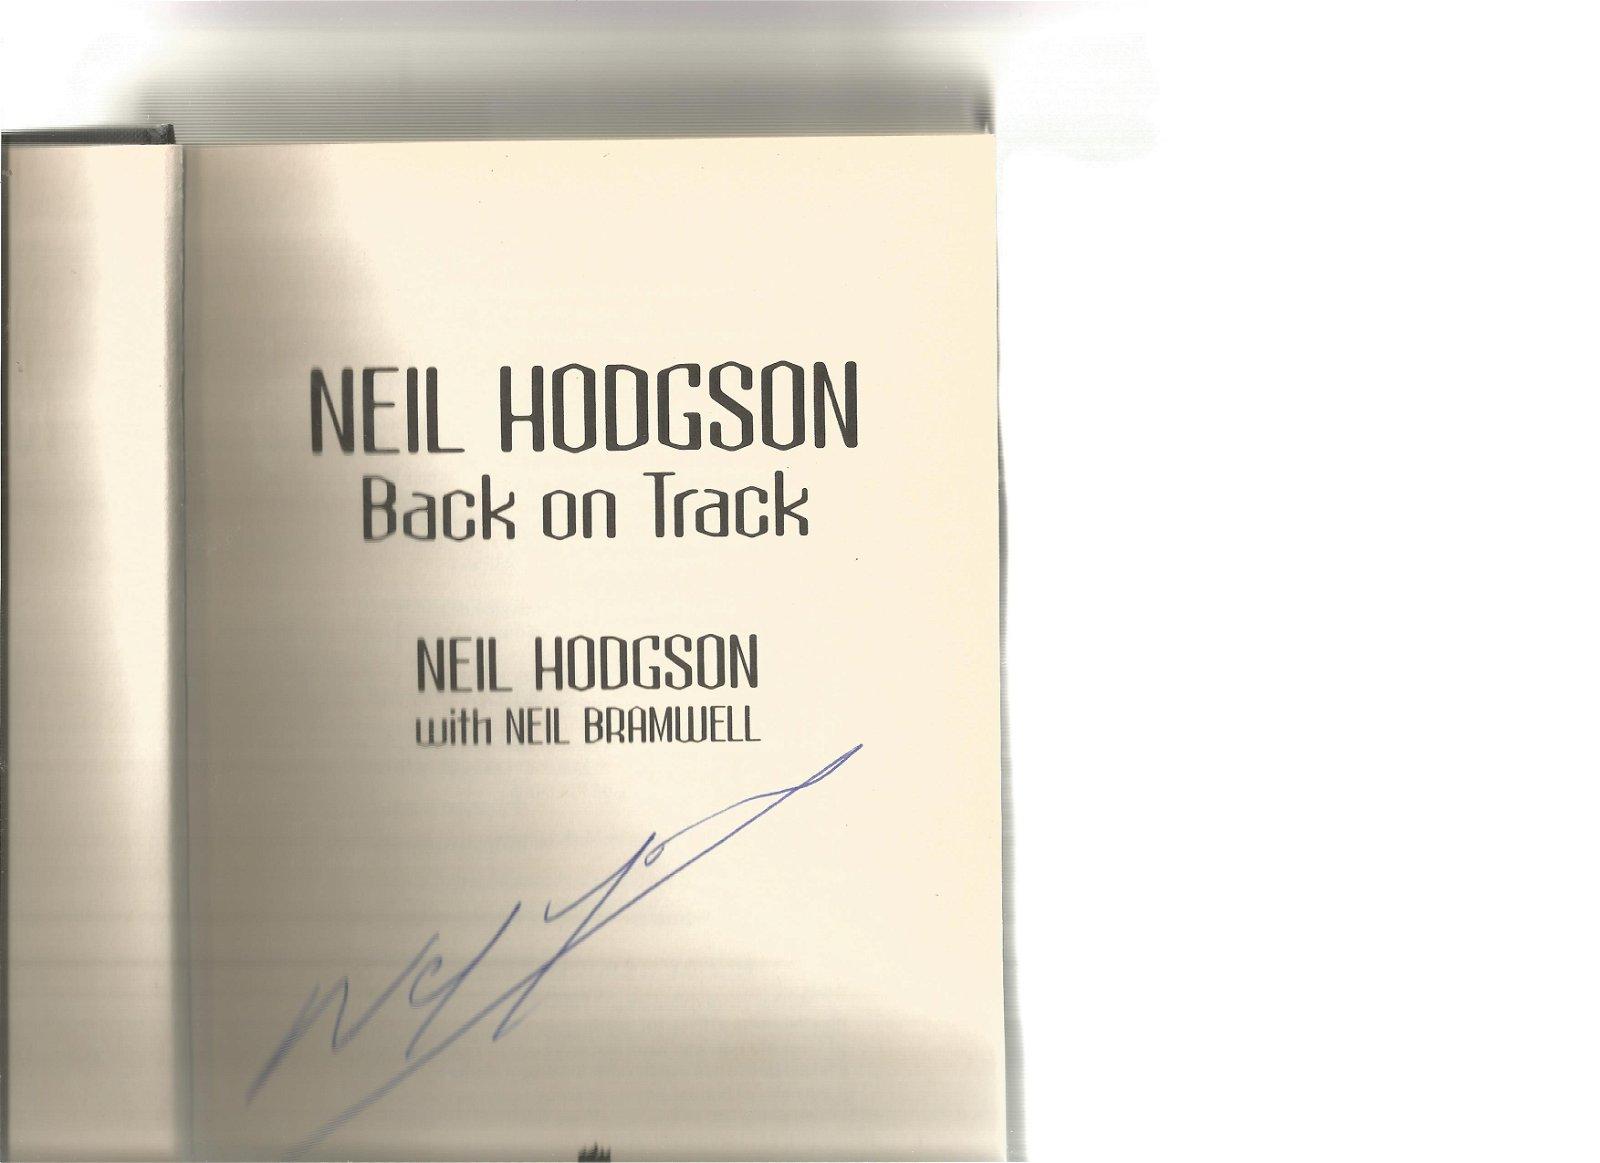 Neil Hodgson signed Back on Track hardback book. Signed